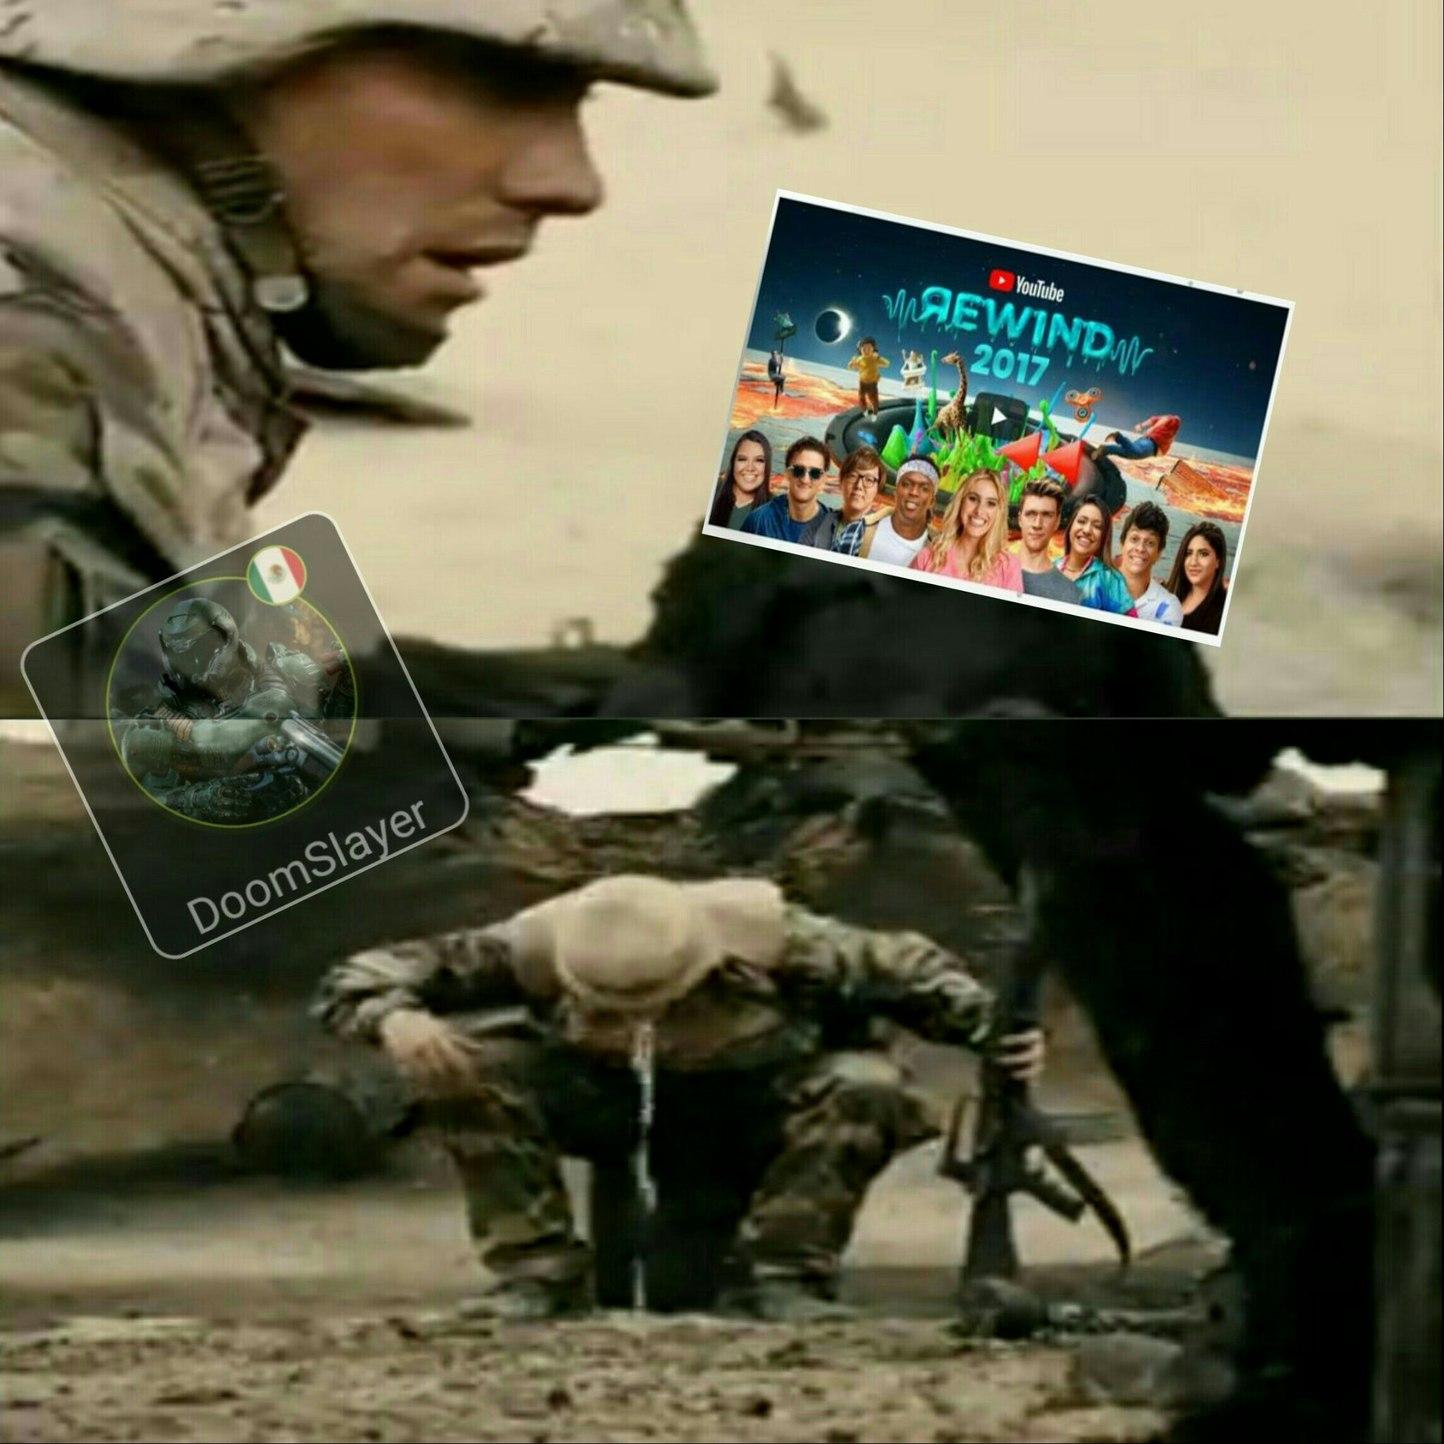 Hjxkxndkddnsldbucndlsosñam - meme